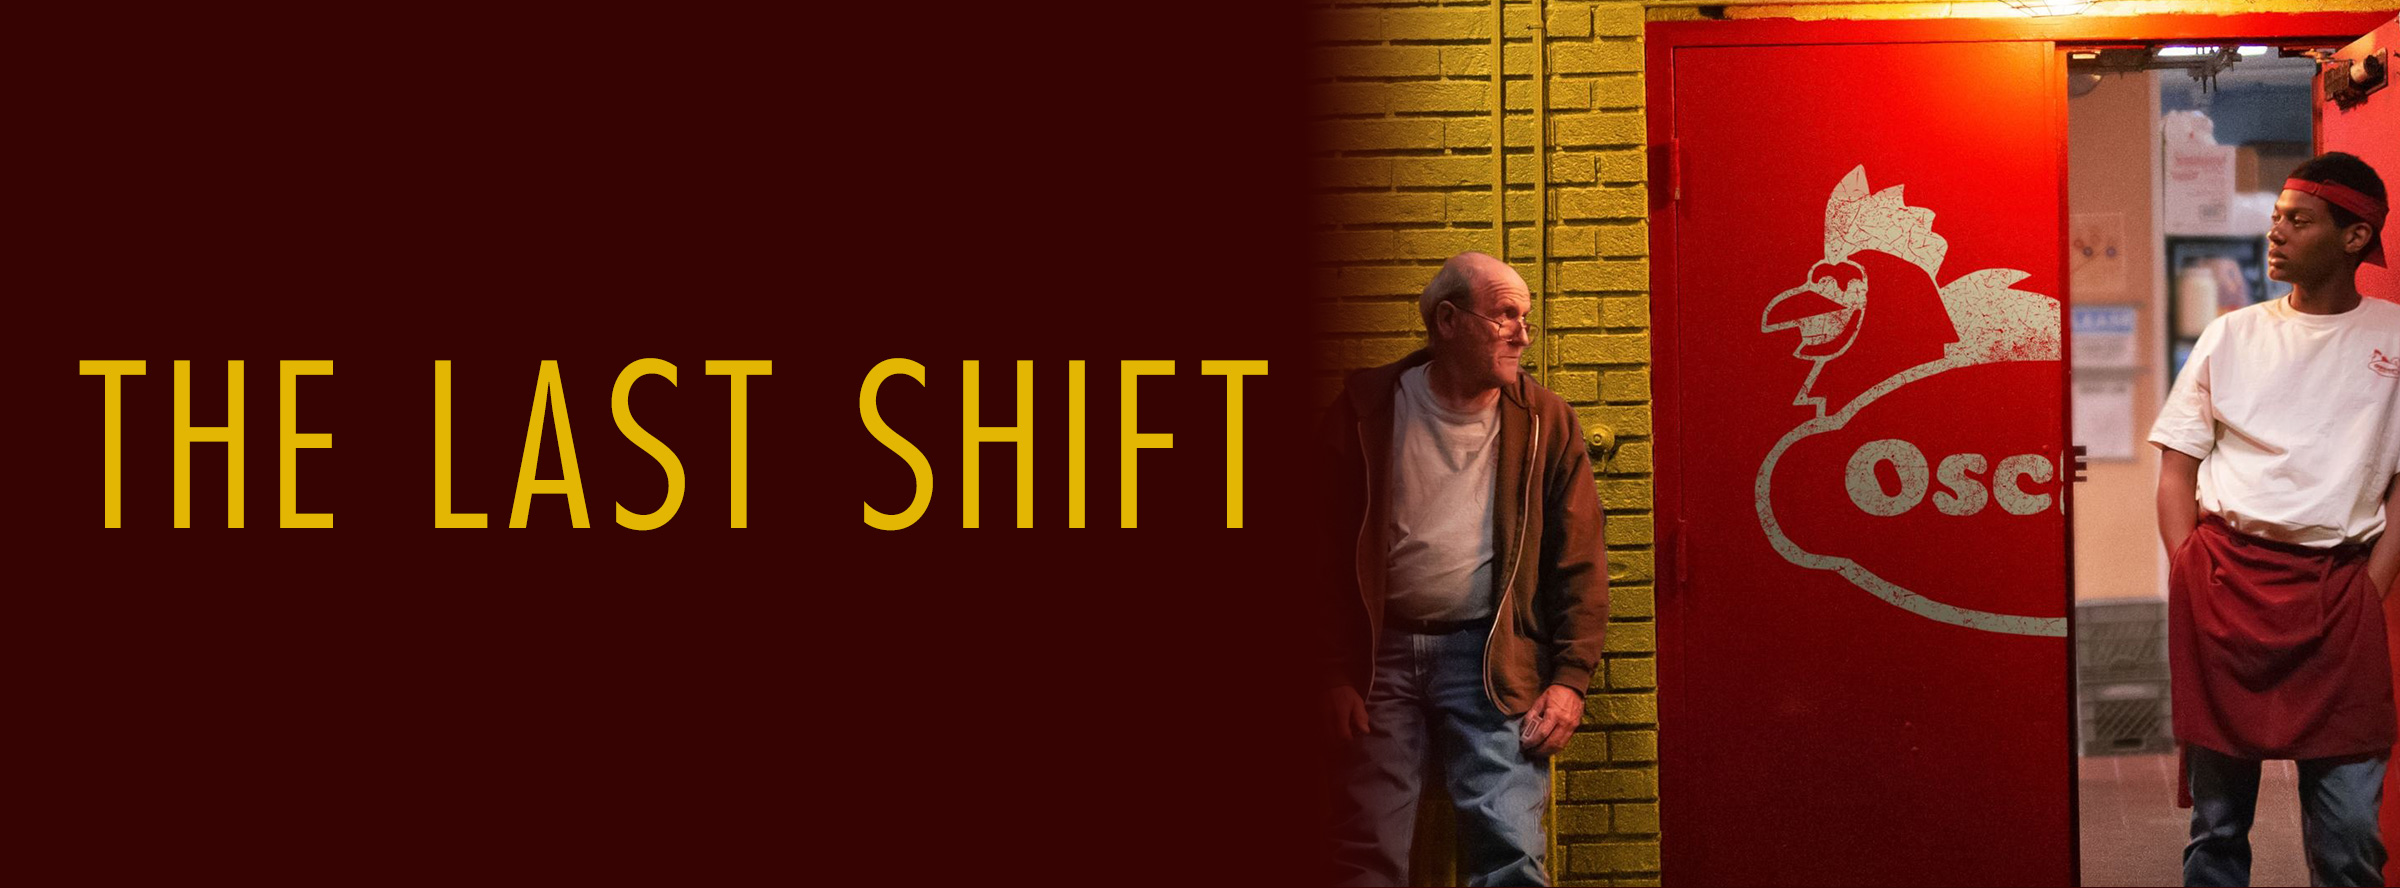 Slider Image for The Last Shift